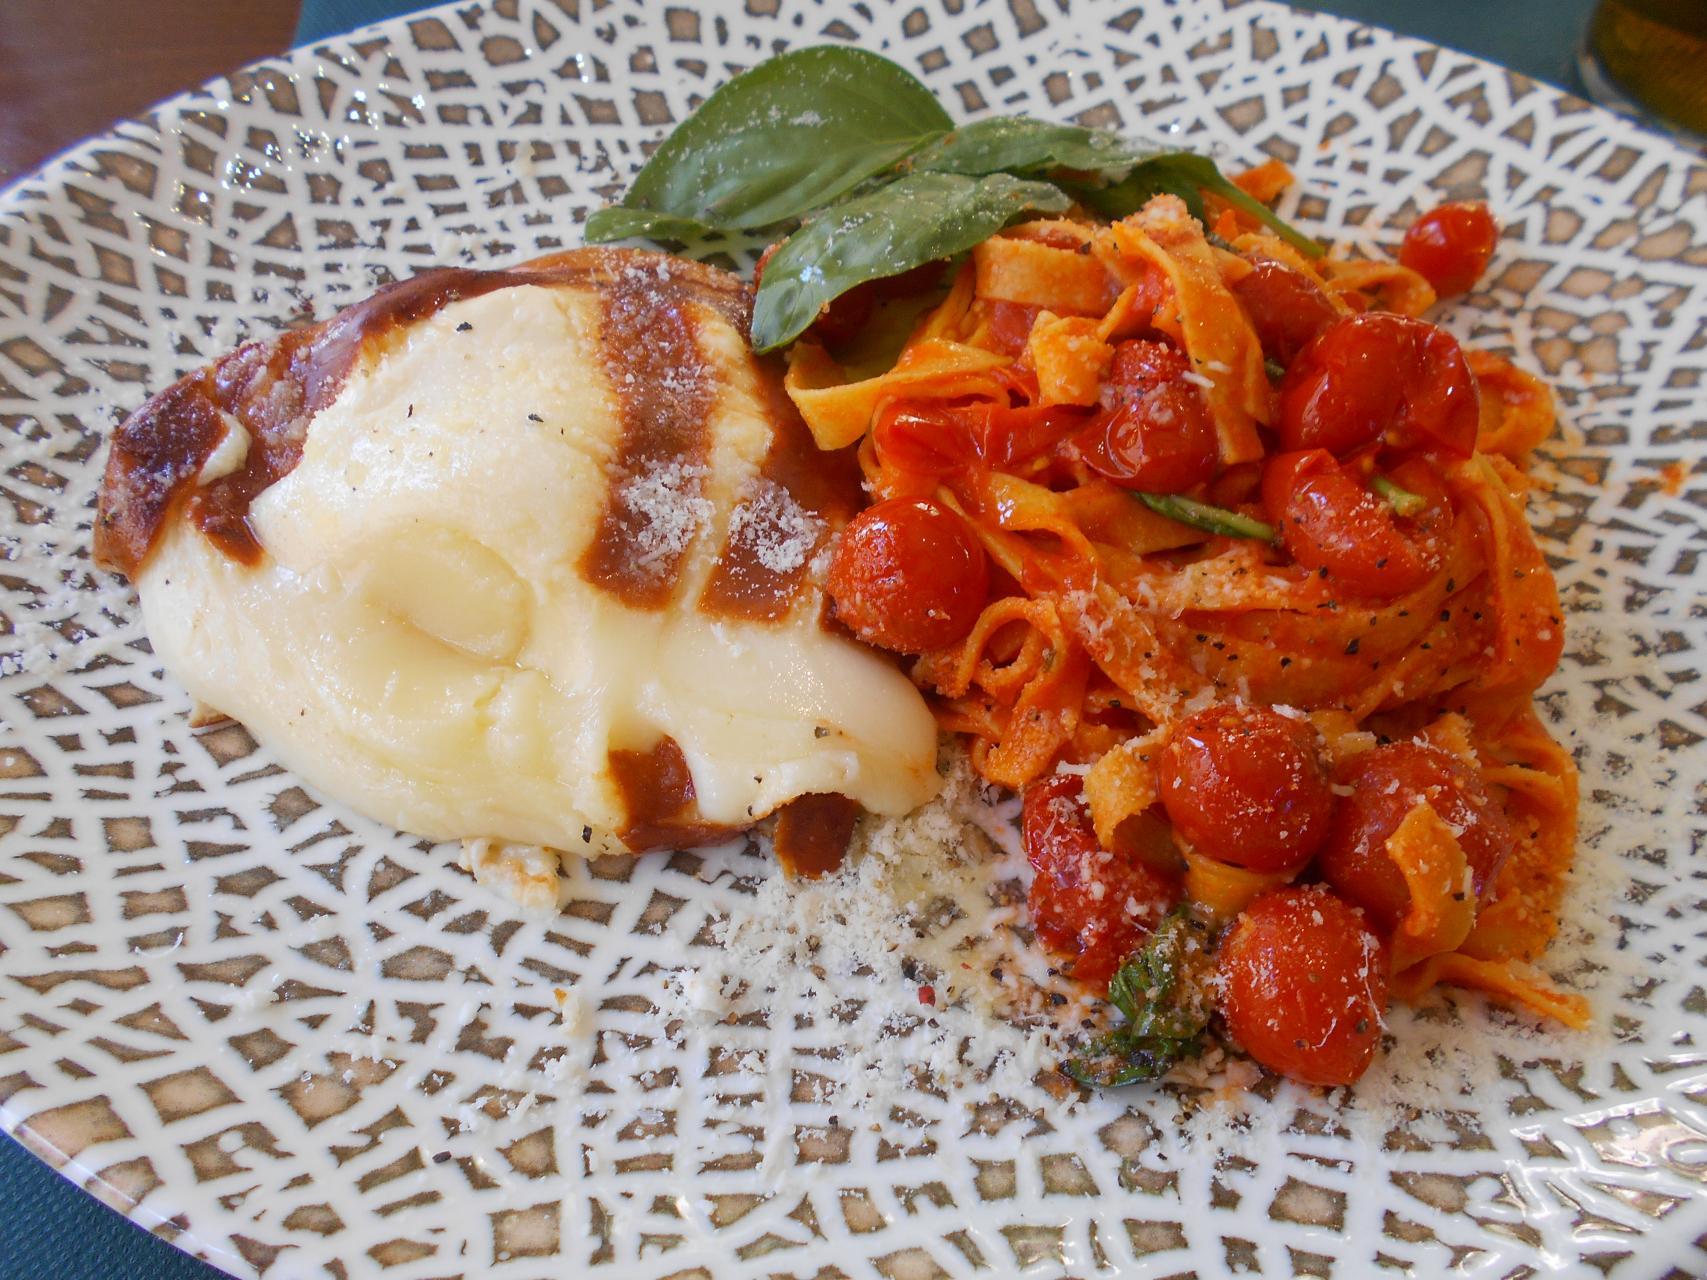 scamorza with spaghetti